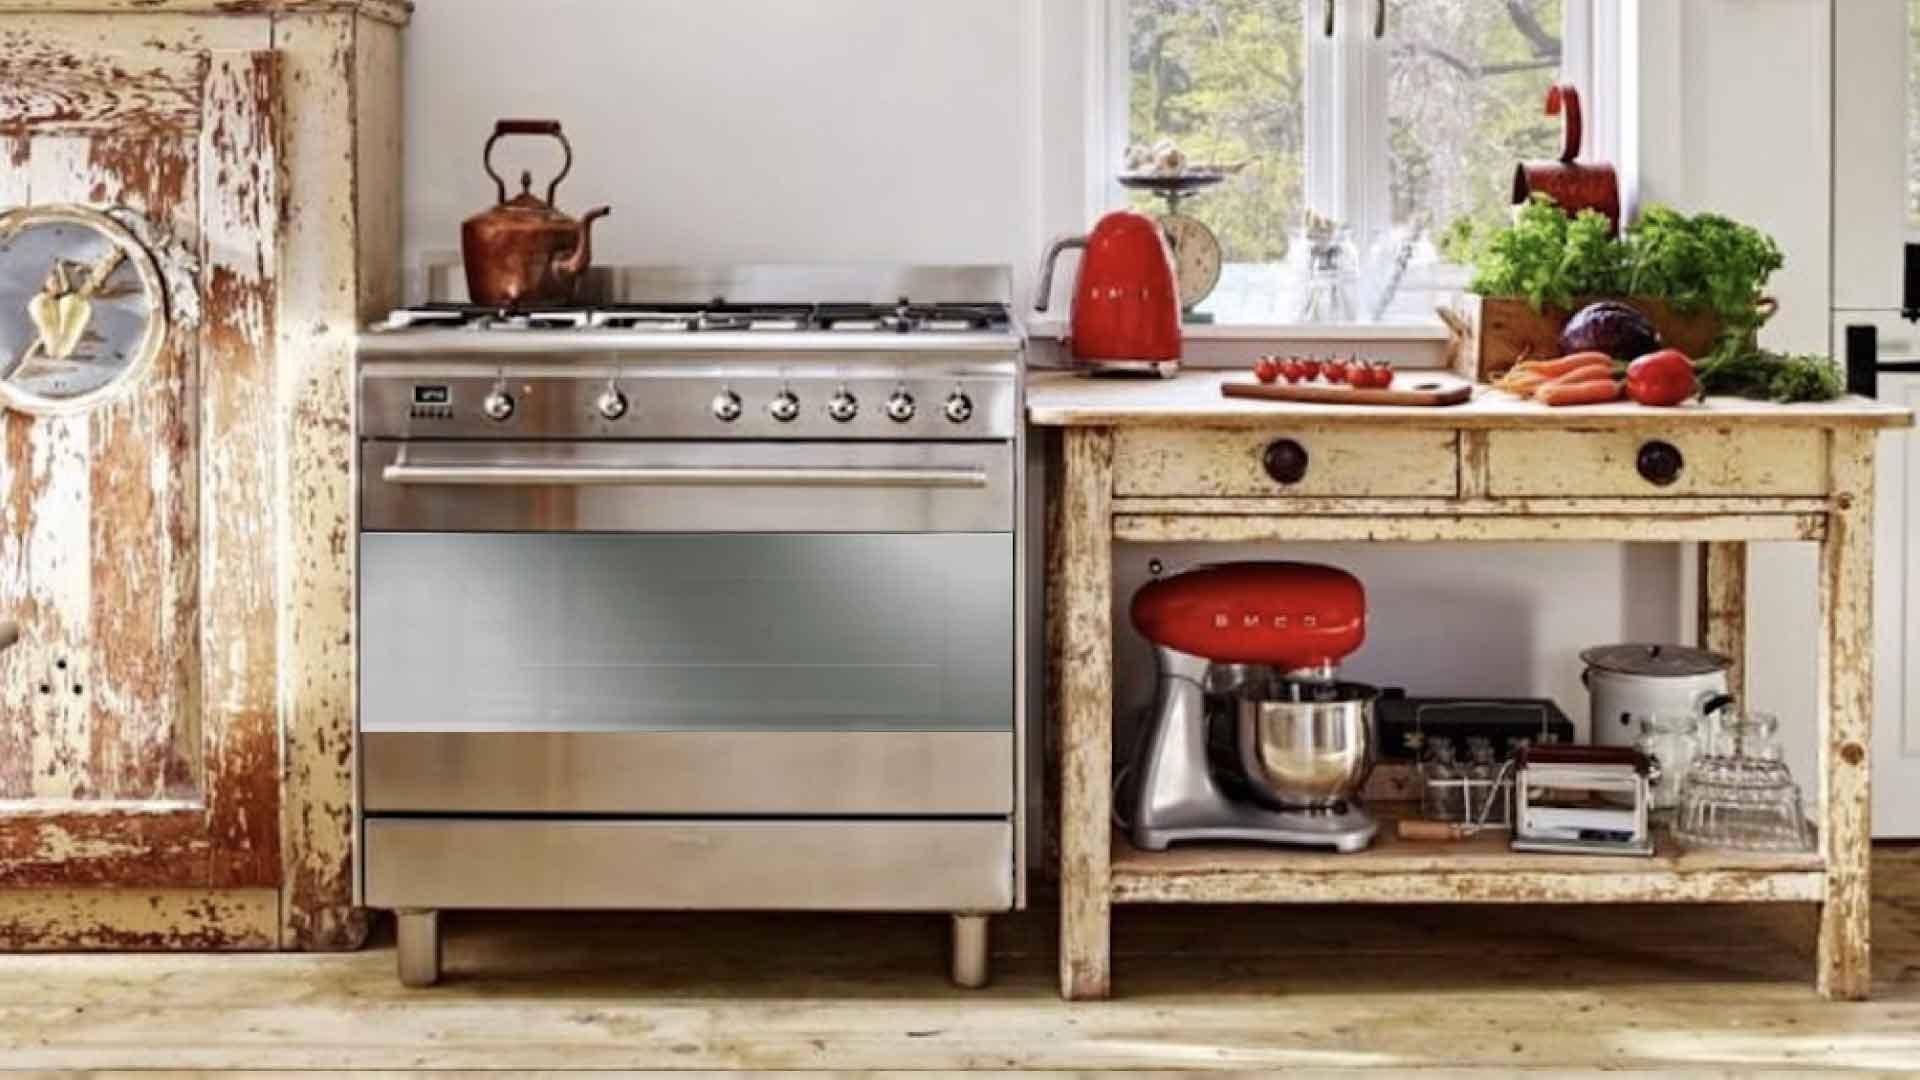 Get the Best Value from the Smeg Concert Range Cooker